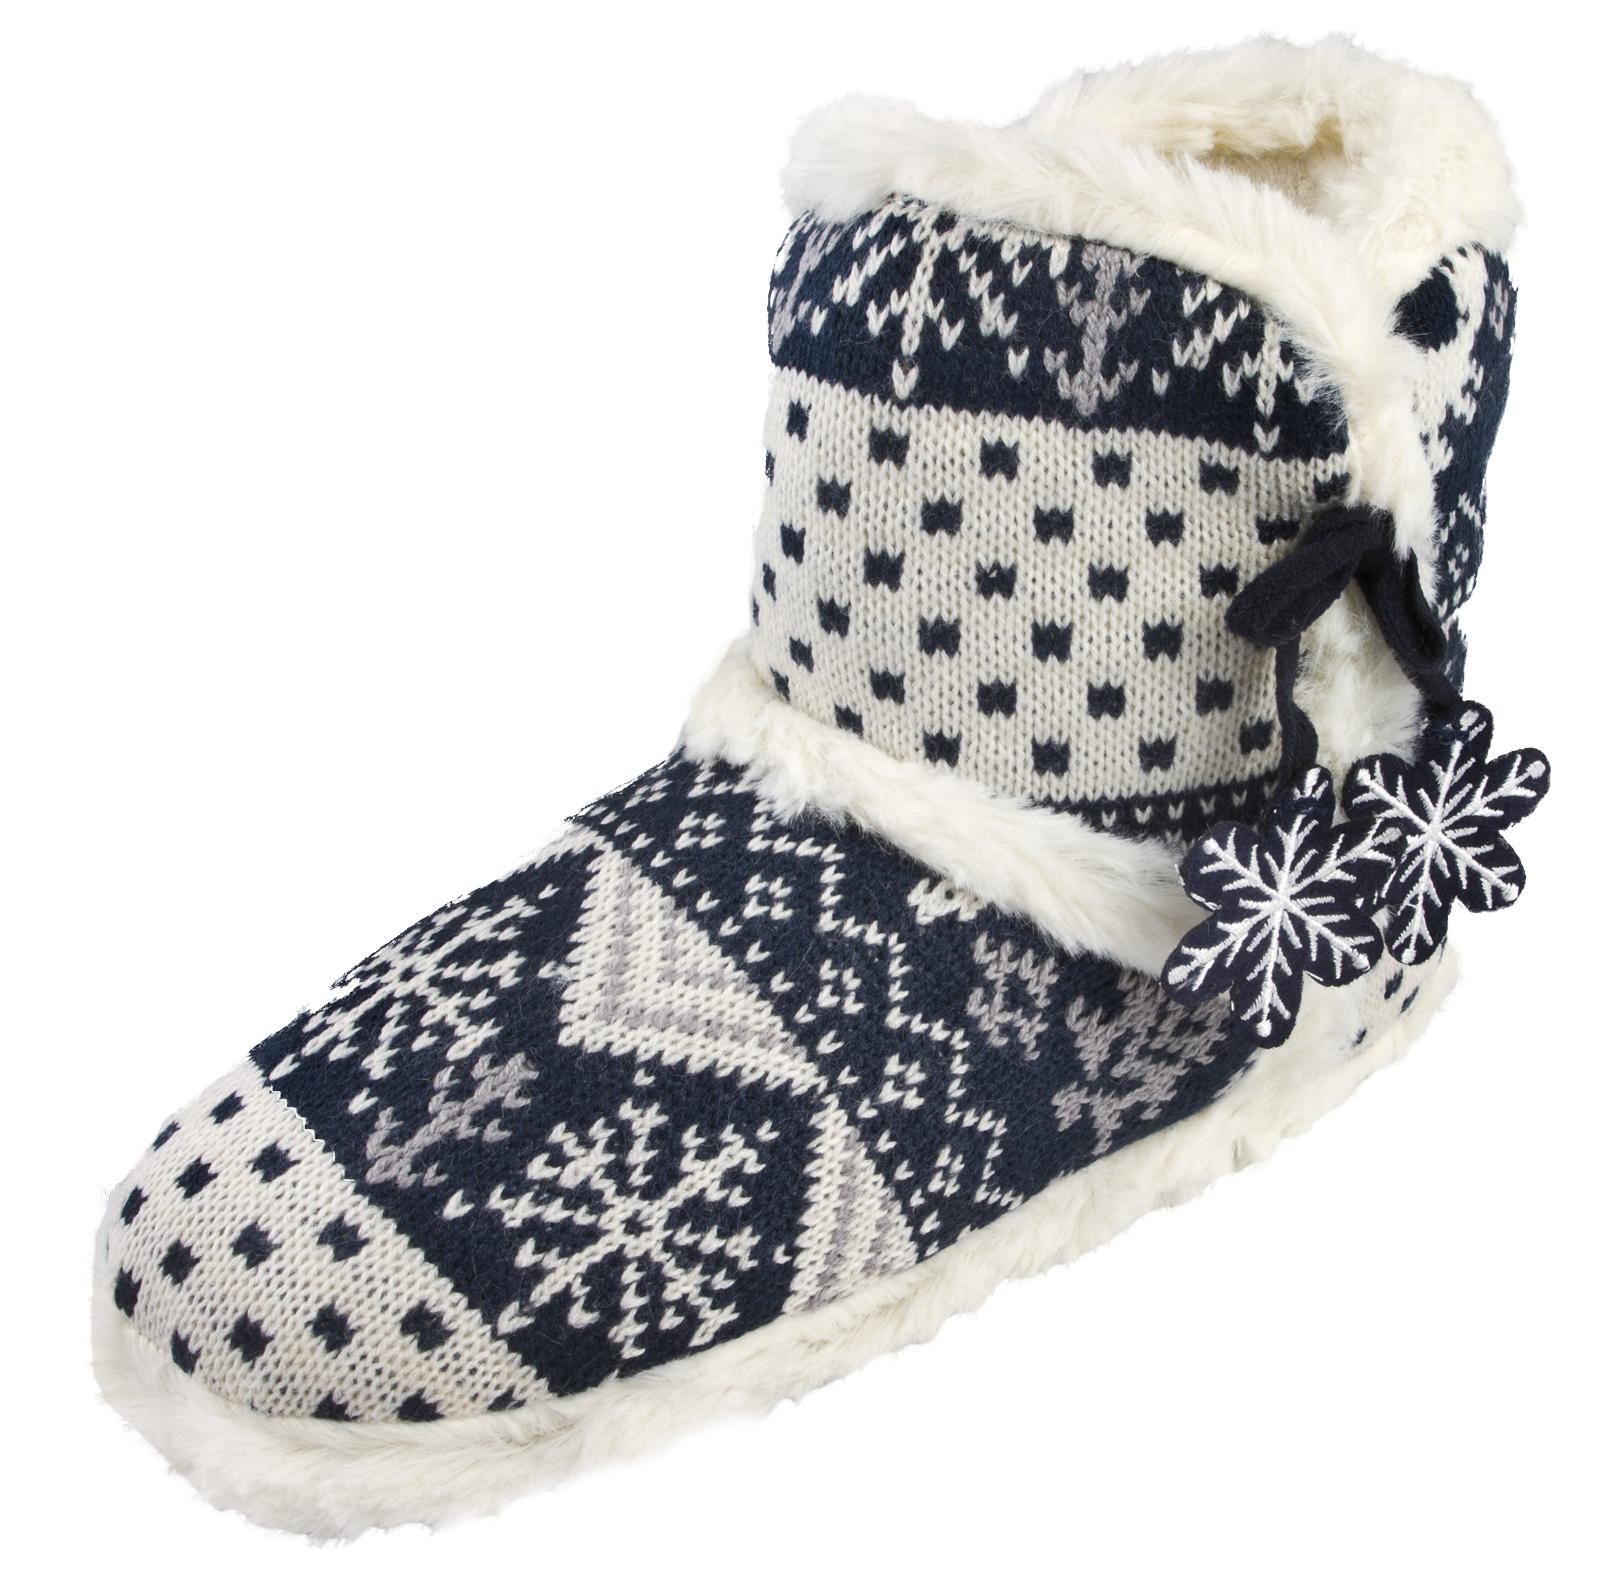 Womens Slipper Boots Knitted Fur Fleece Booties Girls Ladies Slippers Size 3 - 8 | EBay